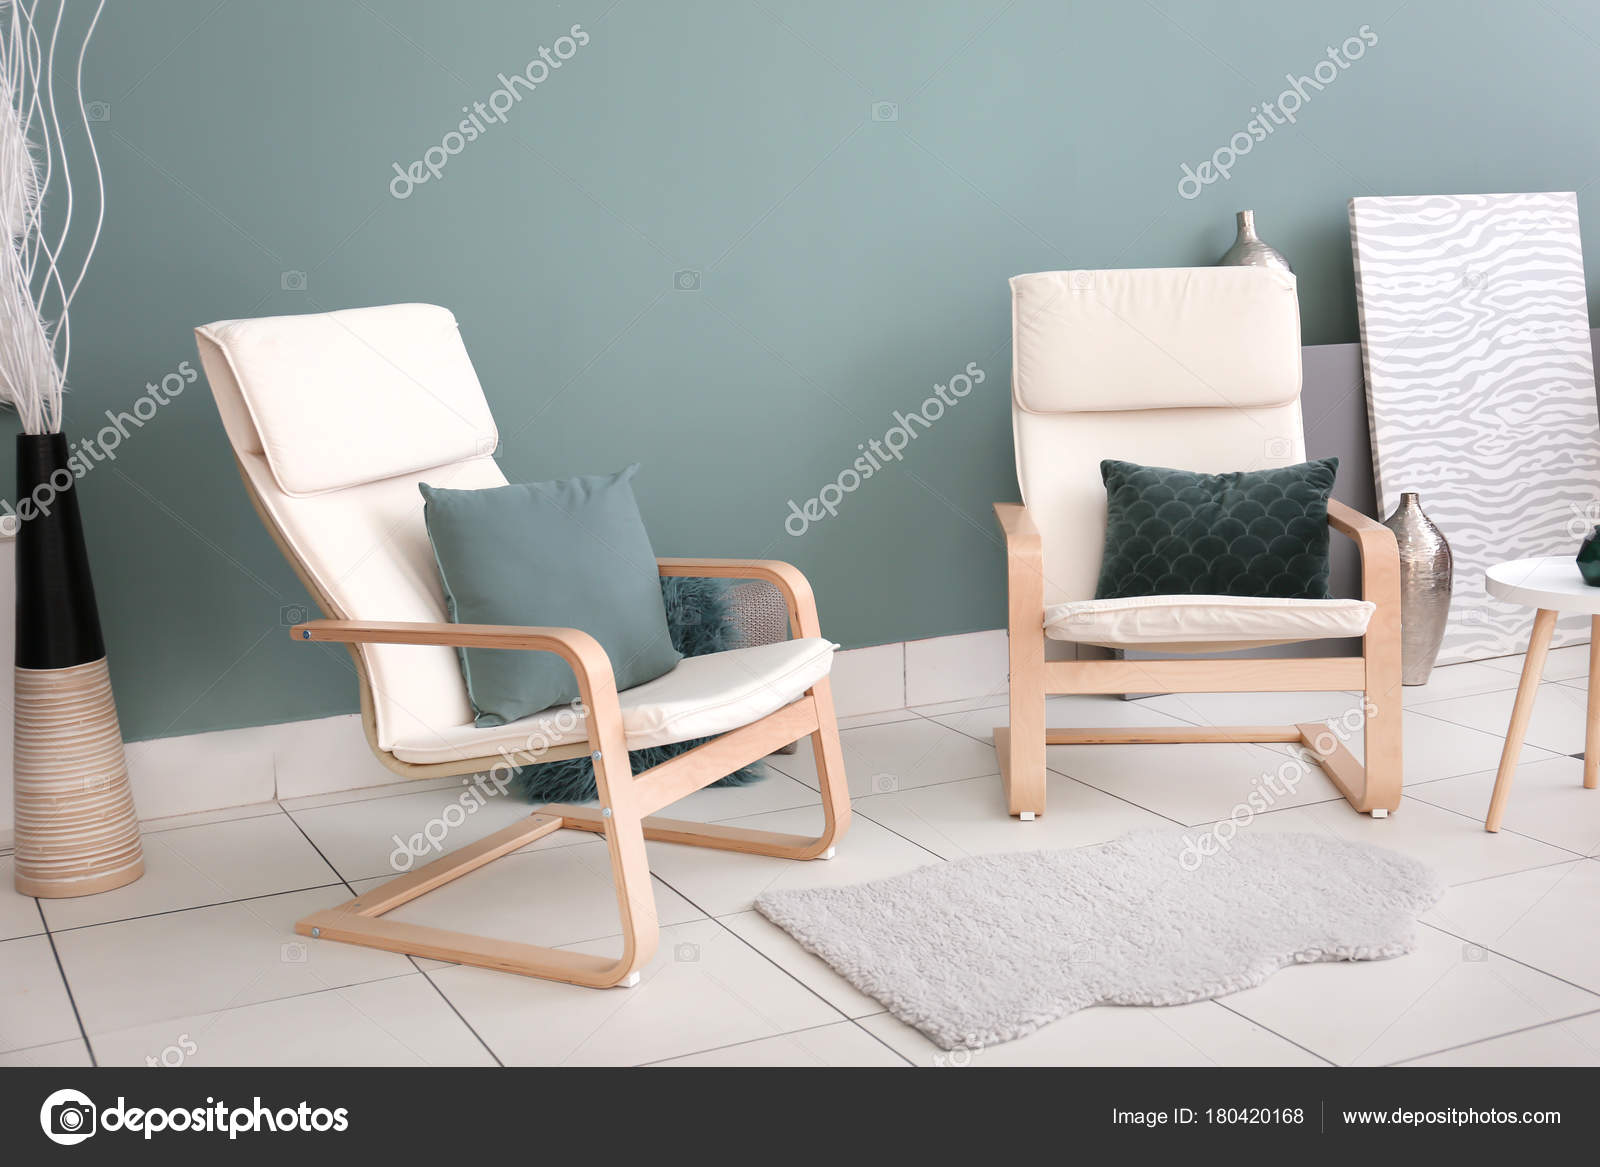 Bequeme Sessel Moderne Wohnzimmer — Stockfoto © belchonock ...